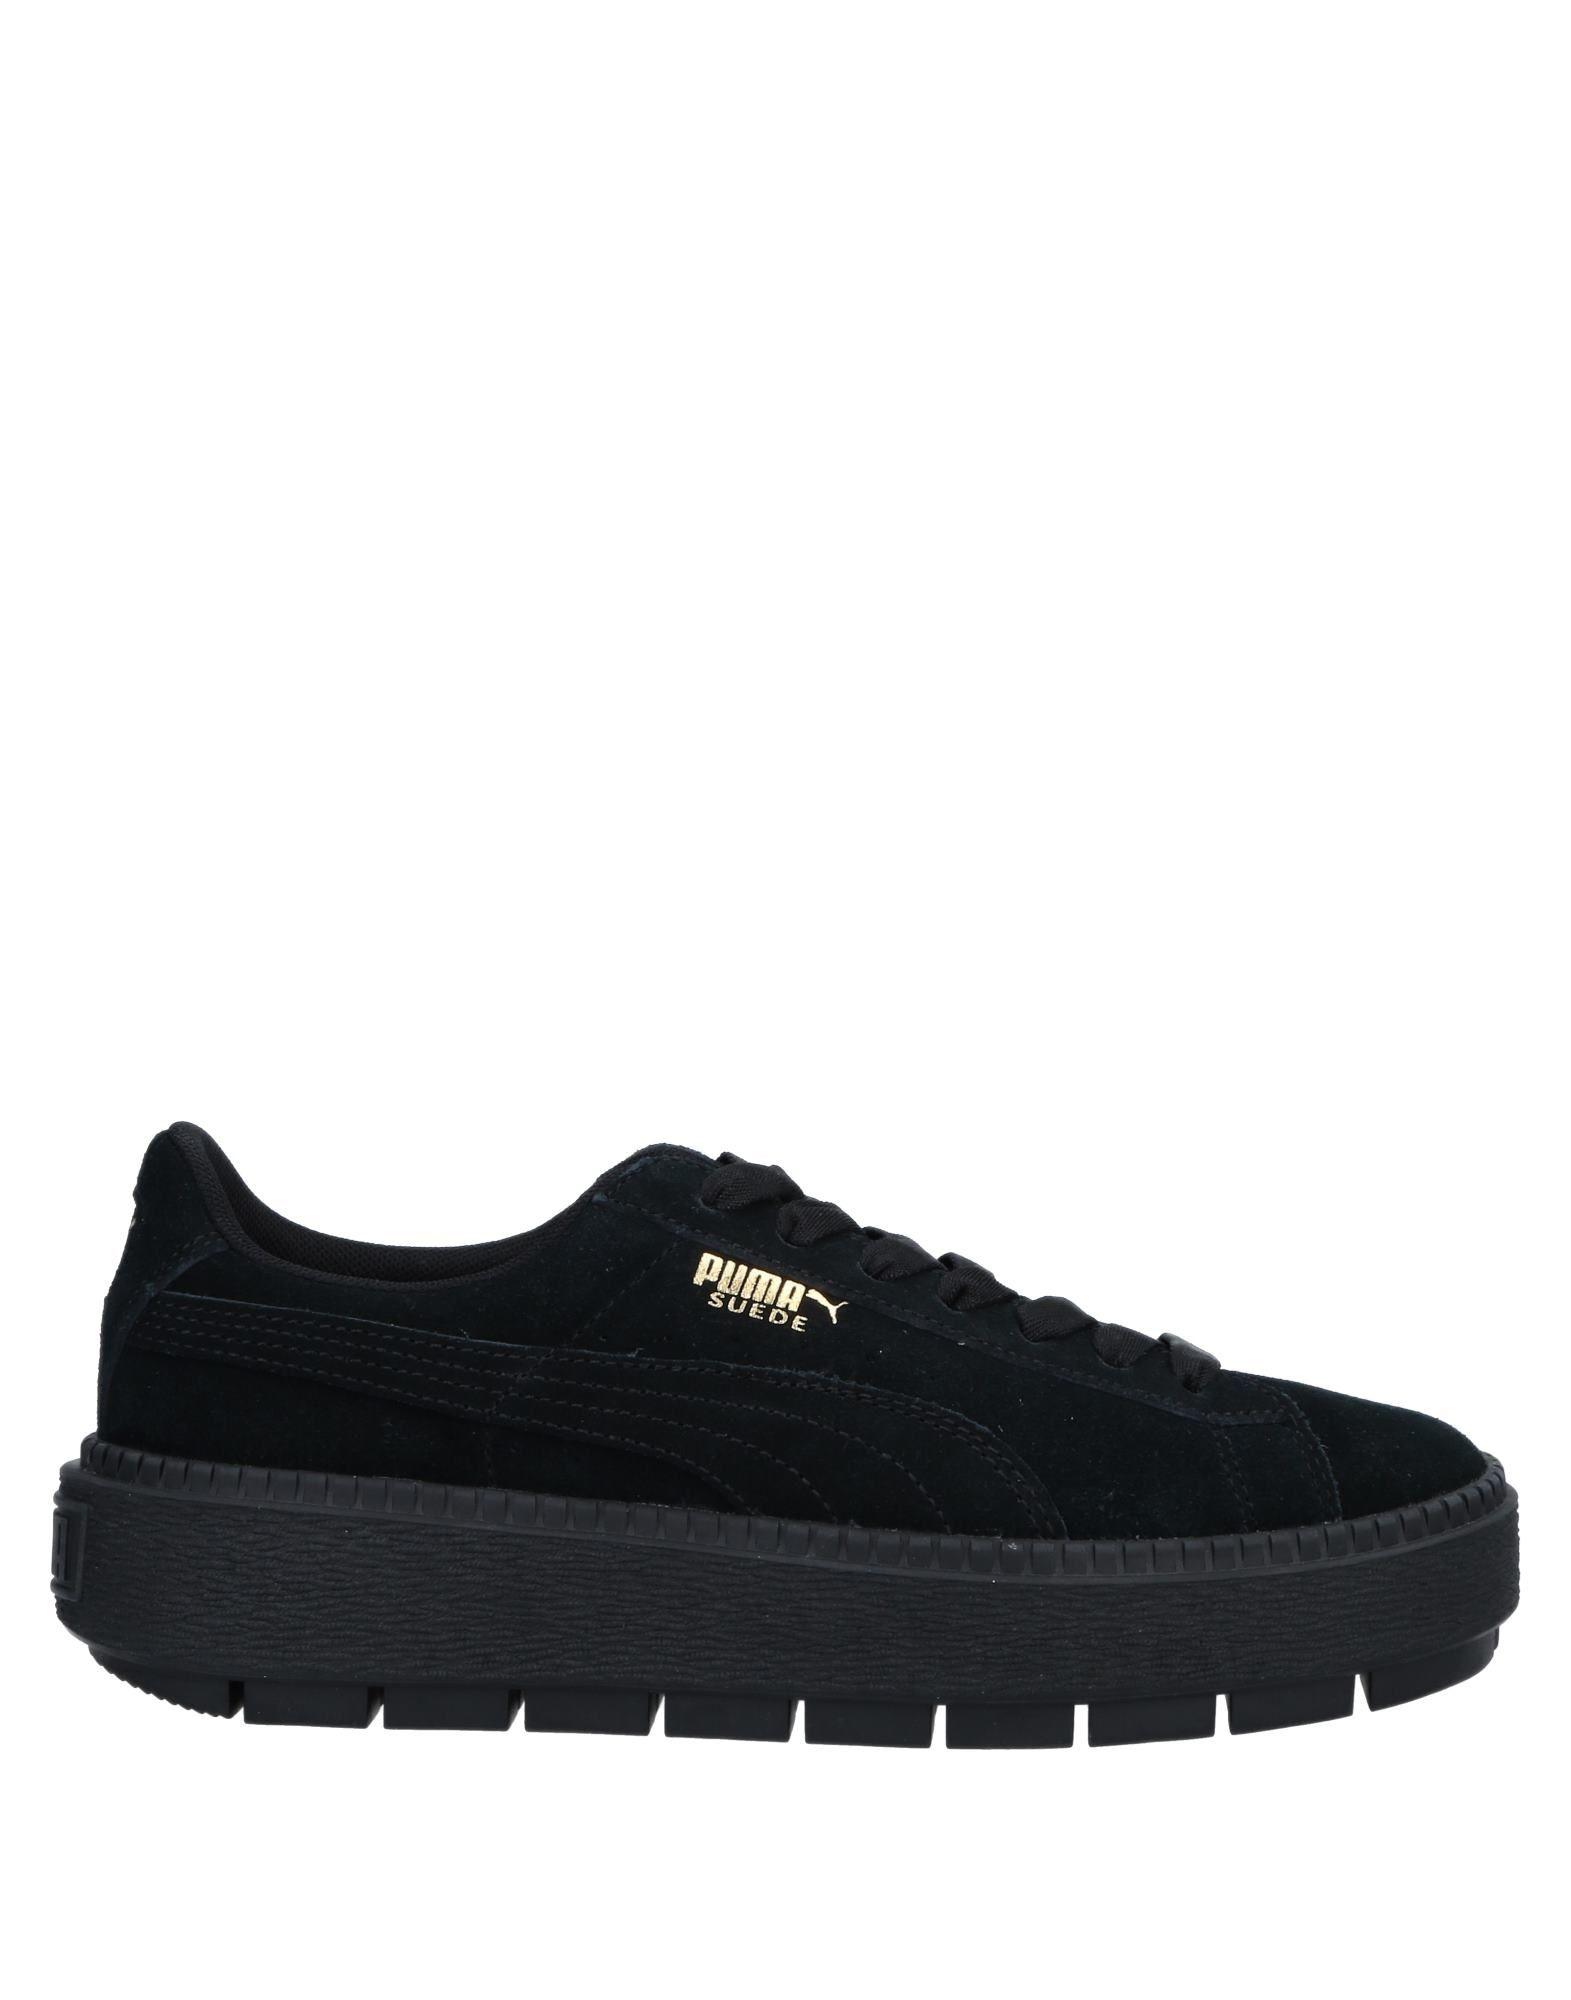 Puma Sneakers Sneakers - Women Puma Sneakers Puma online on  Australia - 11559266IO 601db5